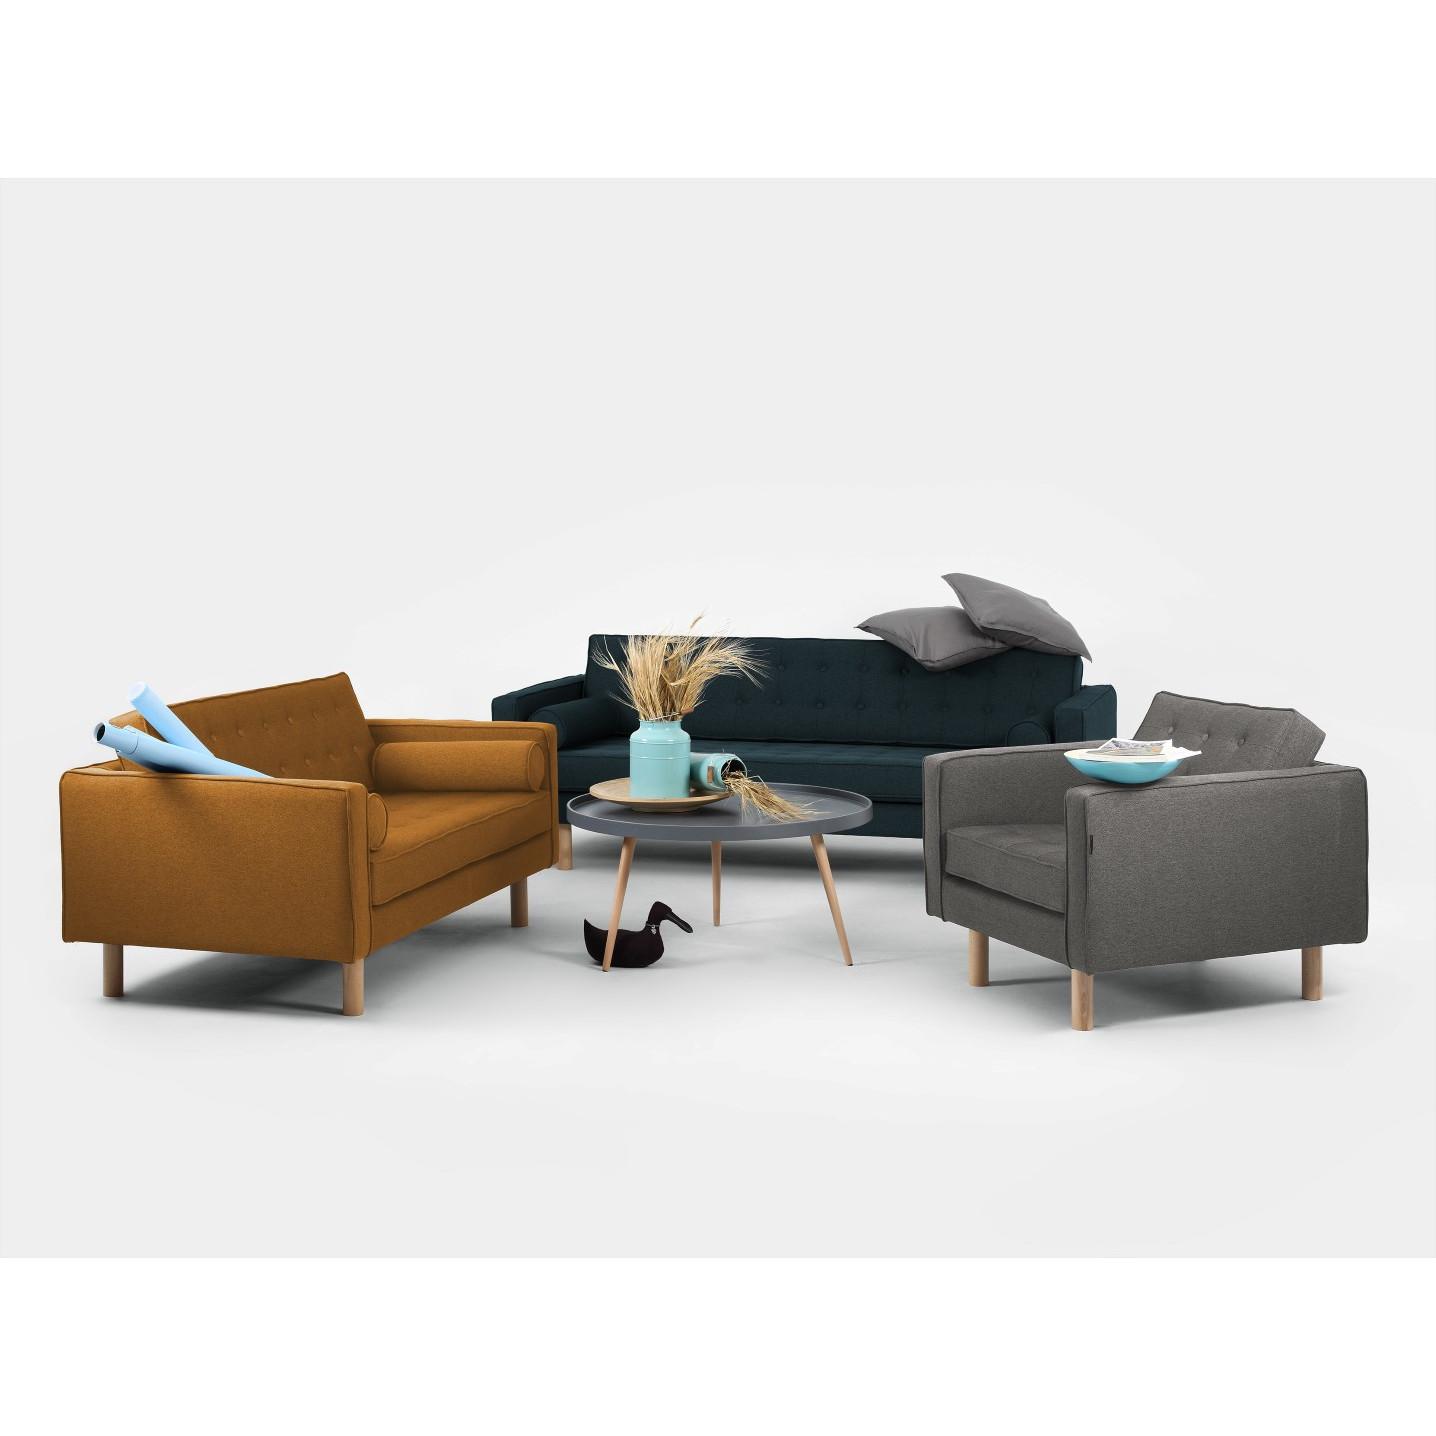 2 Seater Sofa Topic Wood | Honey